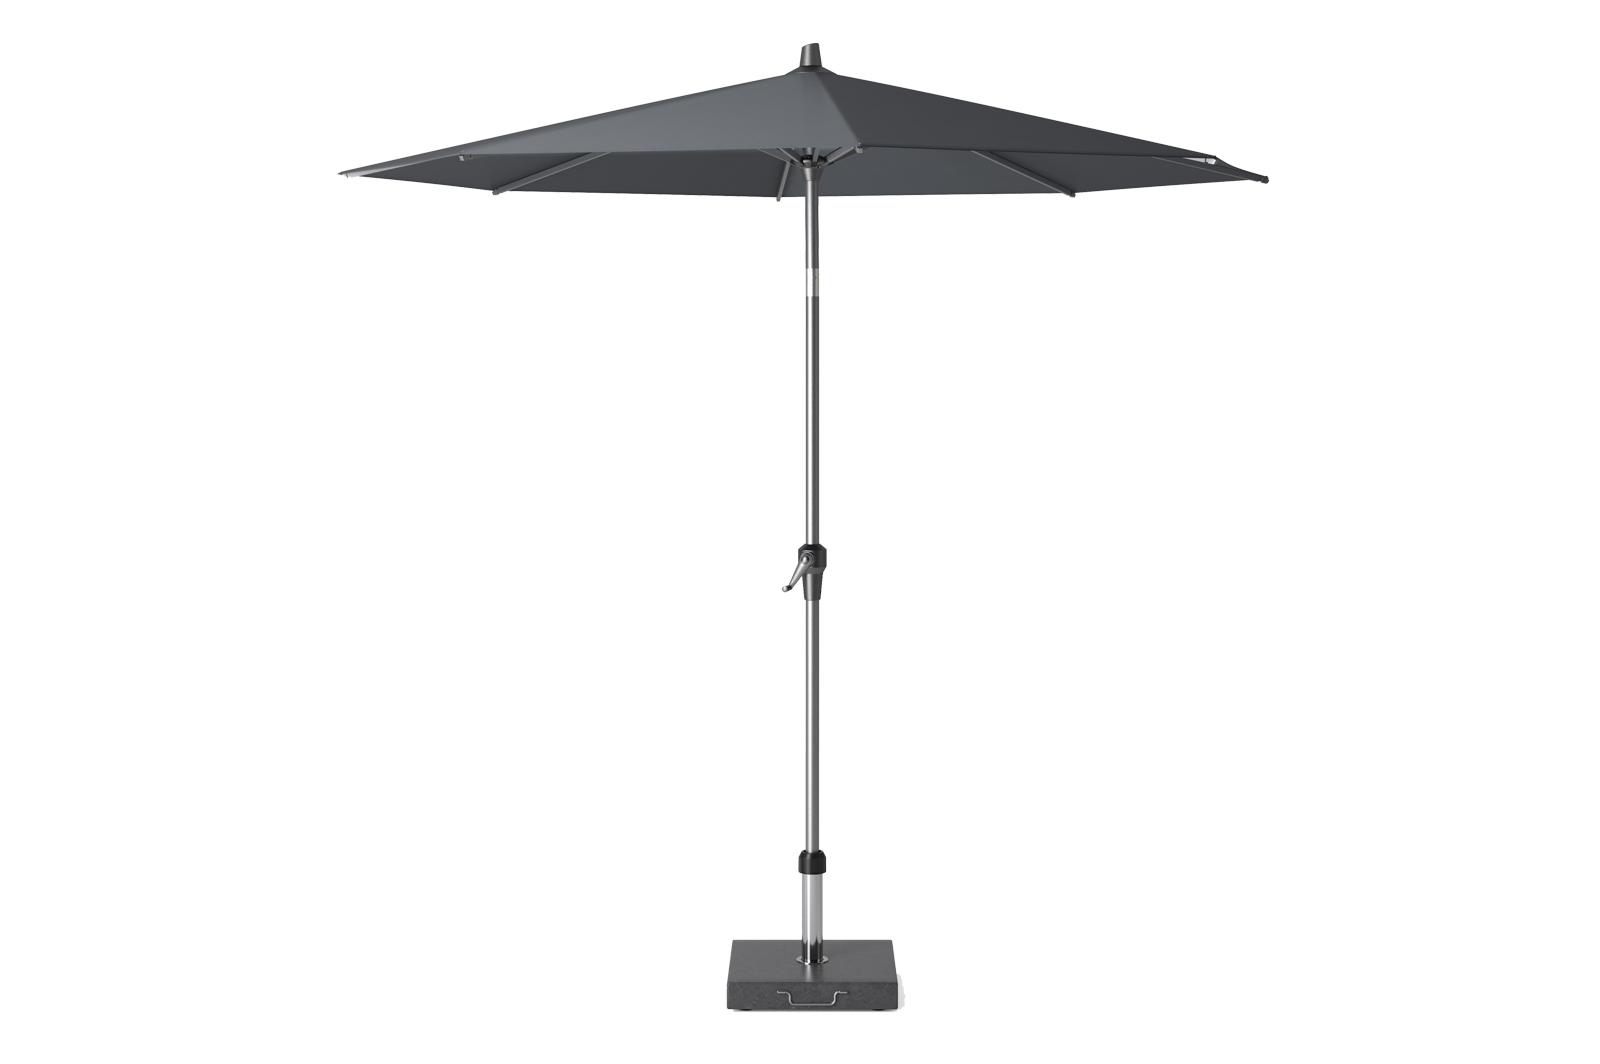 Садовый зонт Riva Ø2,5 м